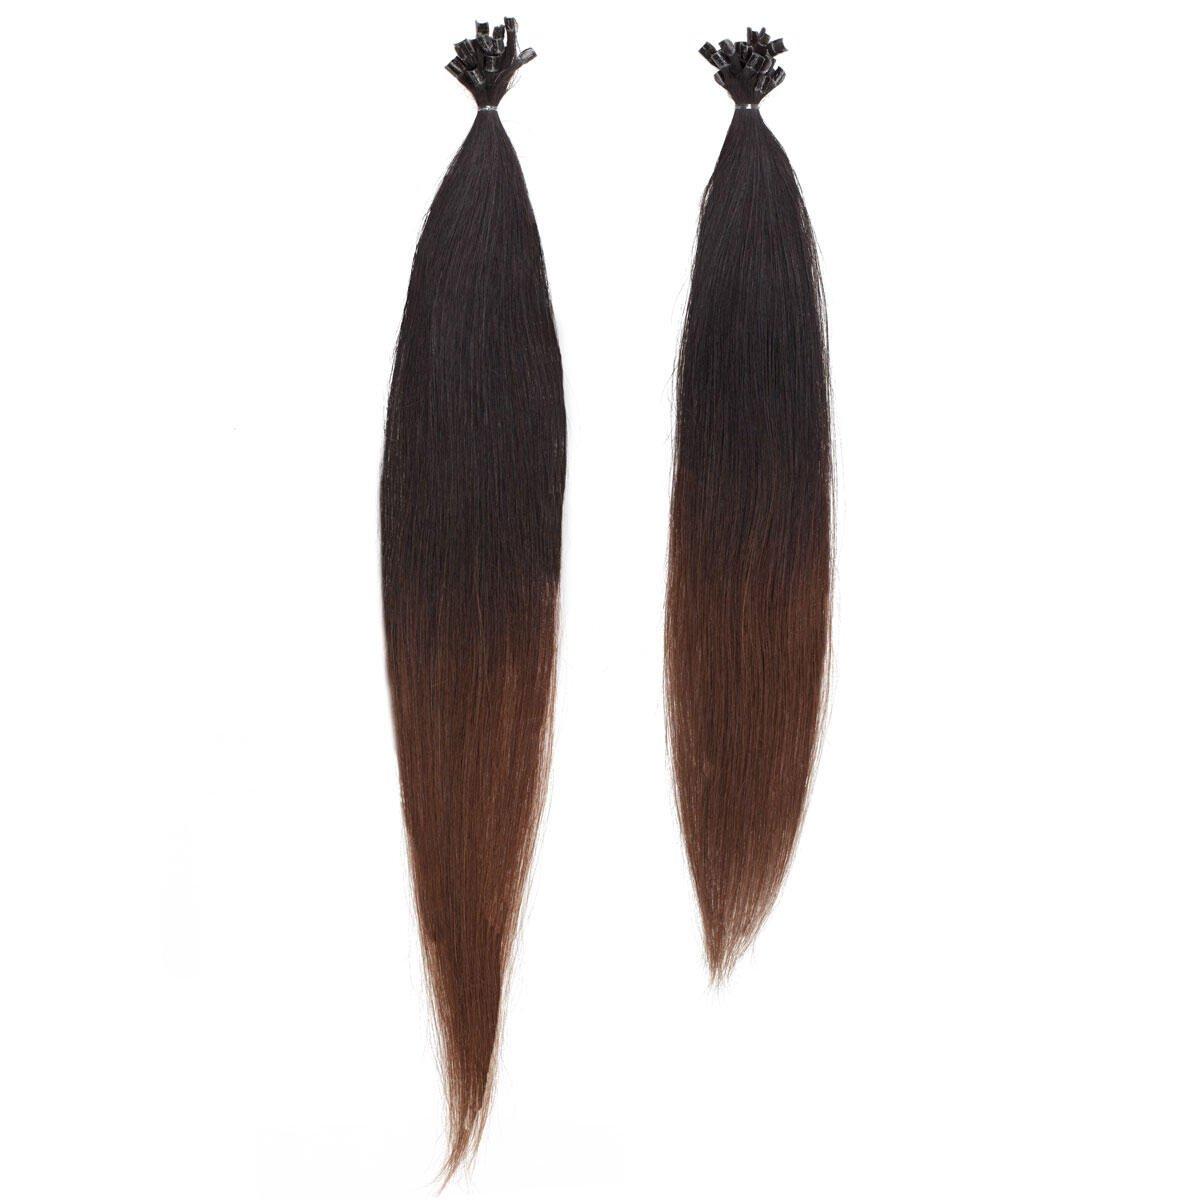 Nail Hair O1.2/2.0 Black Brown Ombre 40 cm